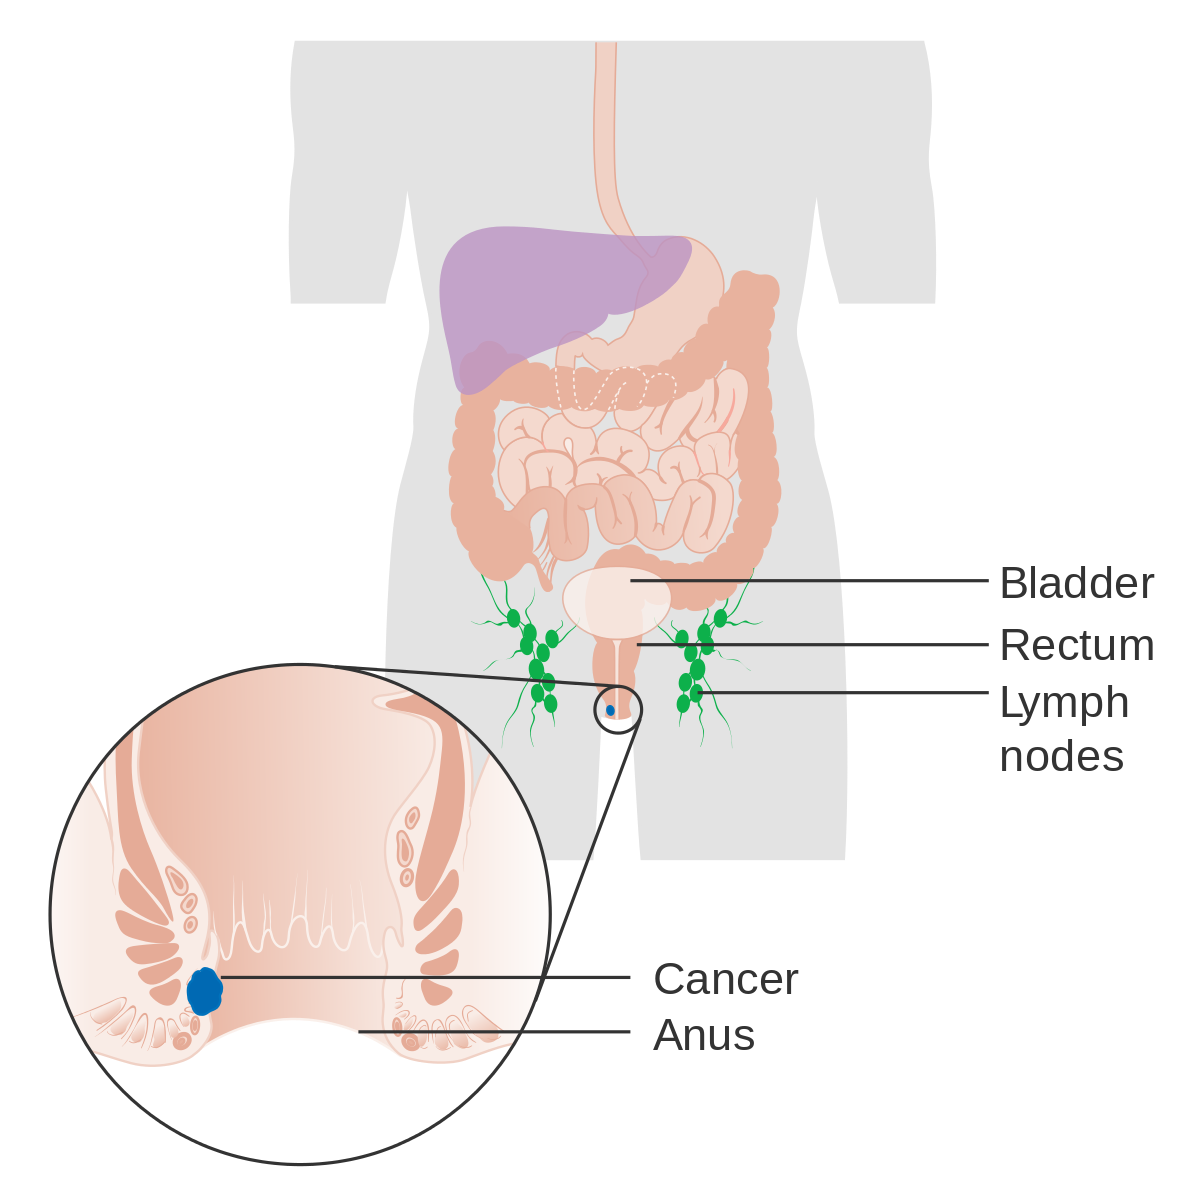 Hpv wart lymph nodes, Hpv wart lymph nodes